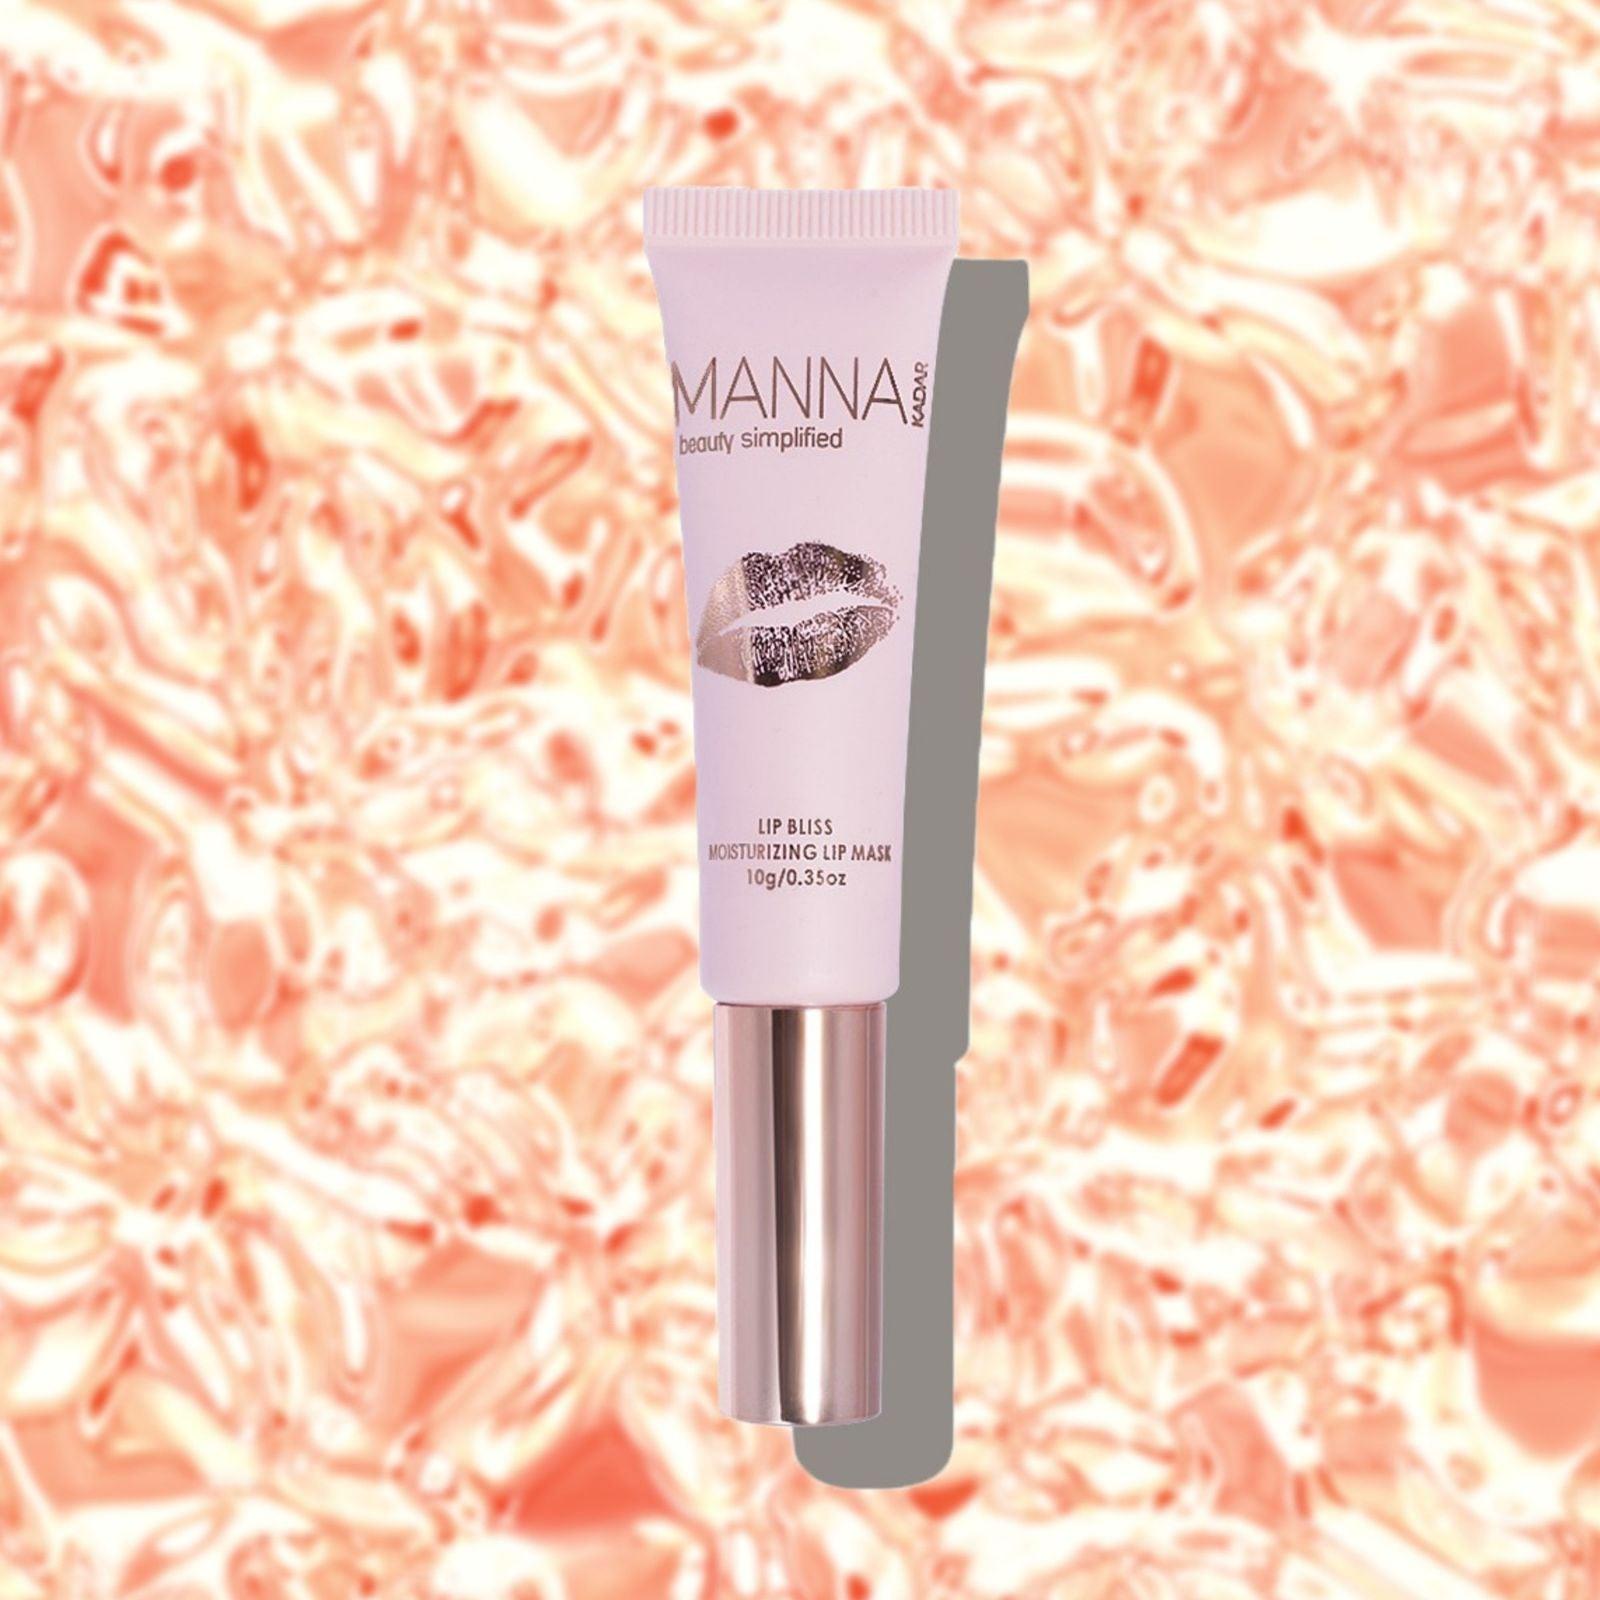 Manna kadar lip bliss moisturizing lip m